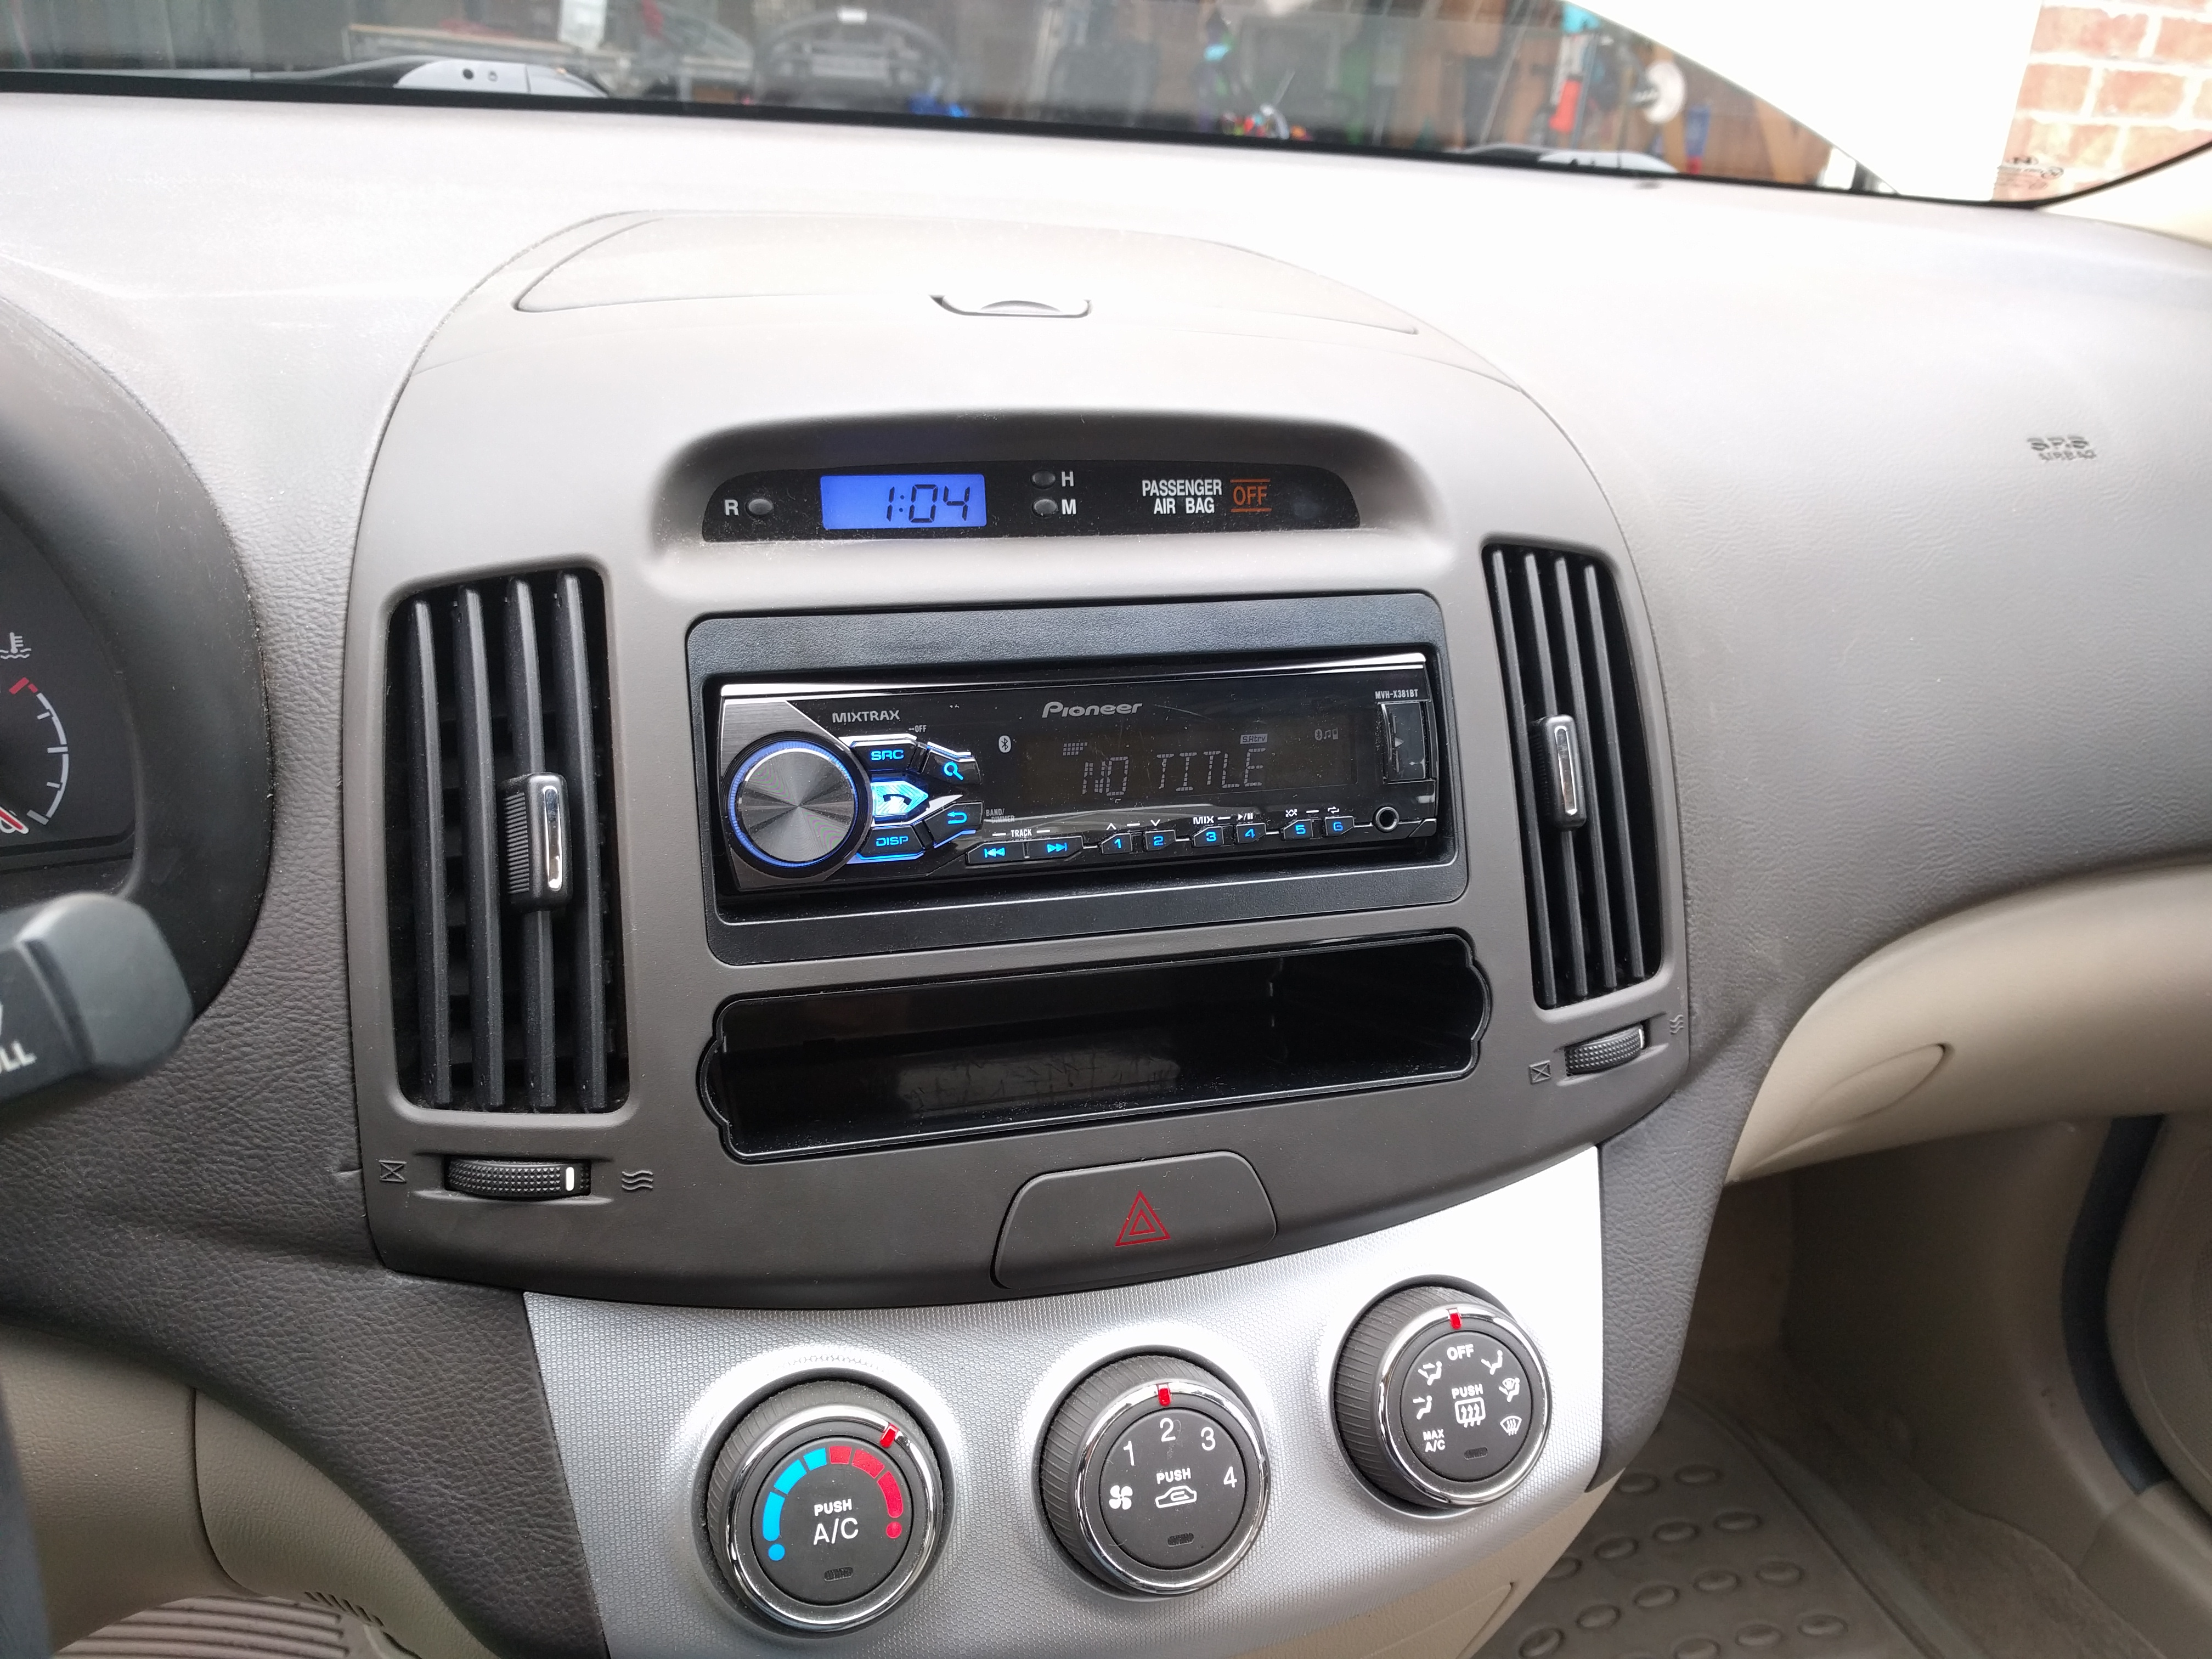 medium resolution of 09 hyundai elantra stereo wiring wiring diagram yer 2009 hyundai elantra stereo wiring diagram 09 hyundai elantra stereo wiring